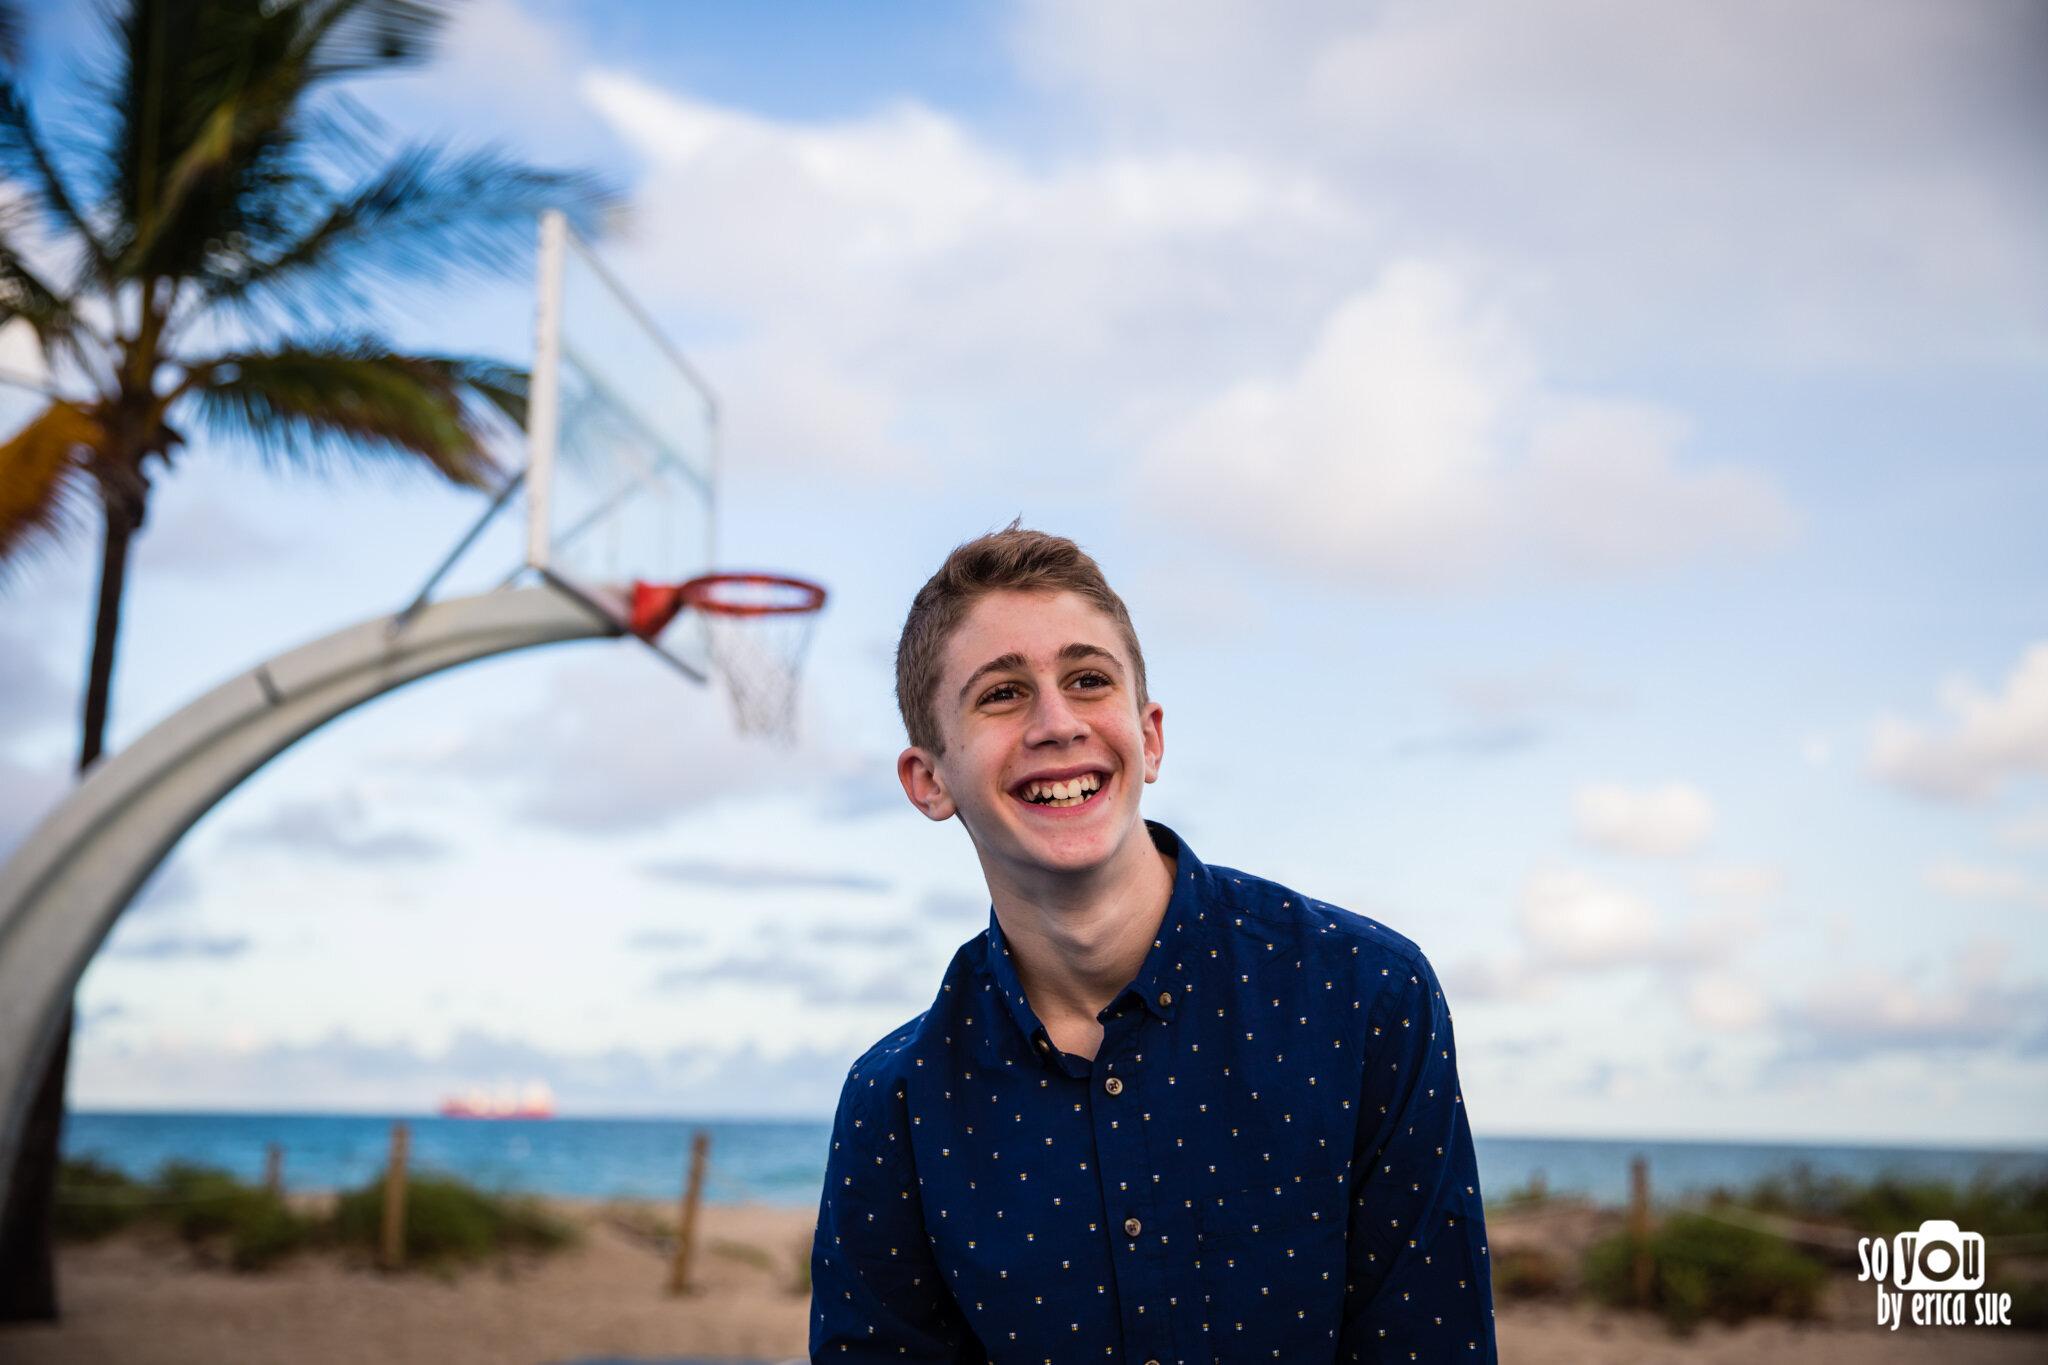 so-you-by-erica-sue-ft-lauderdale-beach-basketball-mitzvah-pre-shoot-9471.JPG